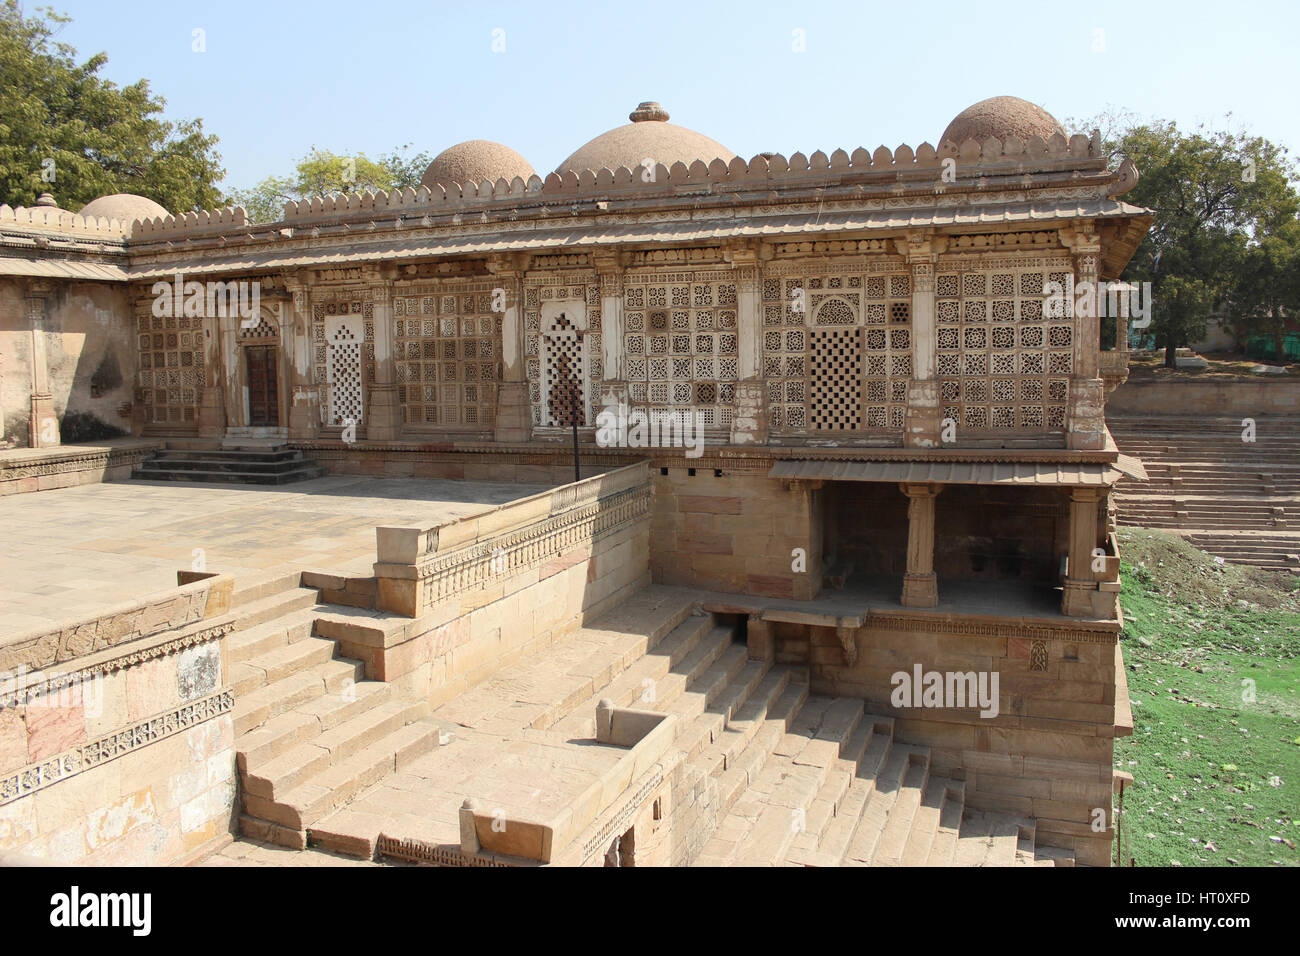 Courtyard towards Sarkhej lake at Sarkhej Roza, Makarba, Ahmedabad in Gujarat India. - Stock Image